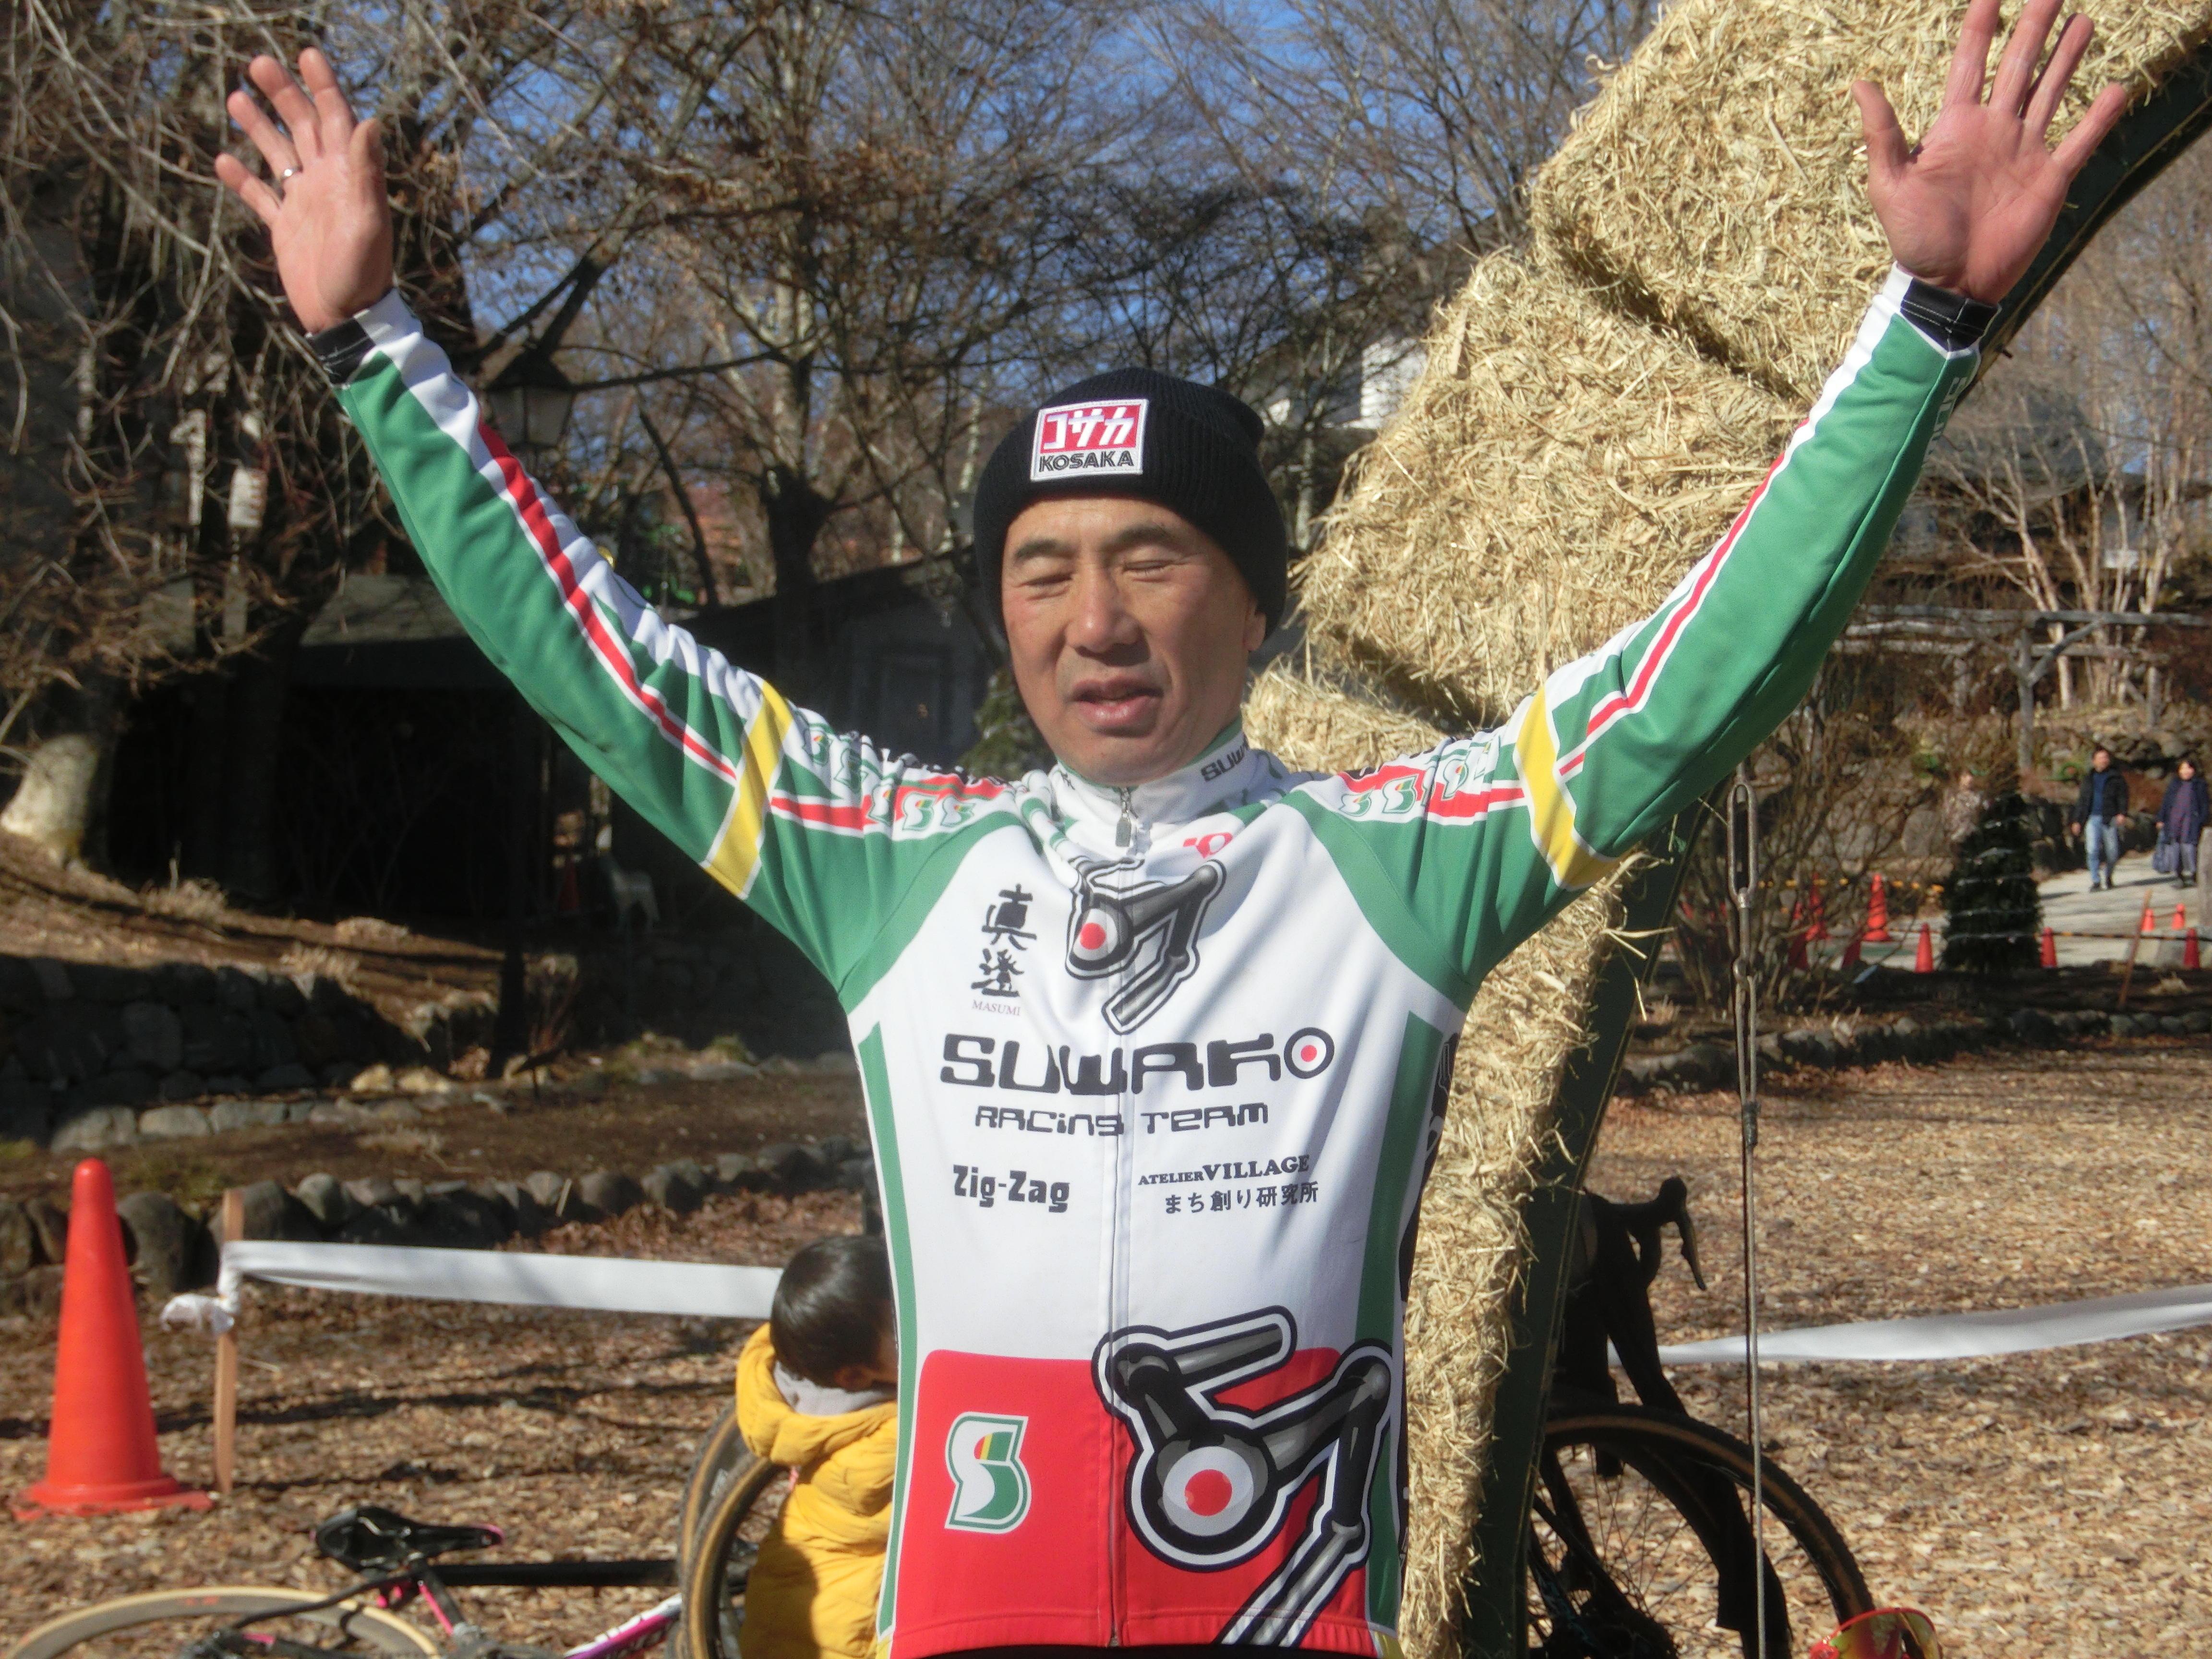 https://www.cyclocross.jp/news/2019_0114CCM189kiyosatomoegi0234.JPG